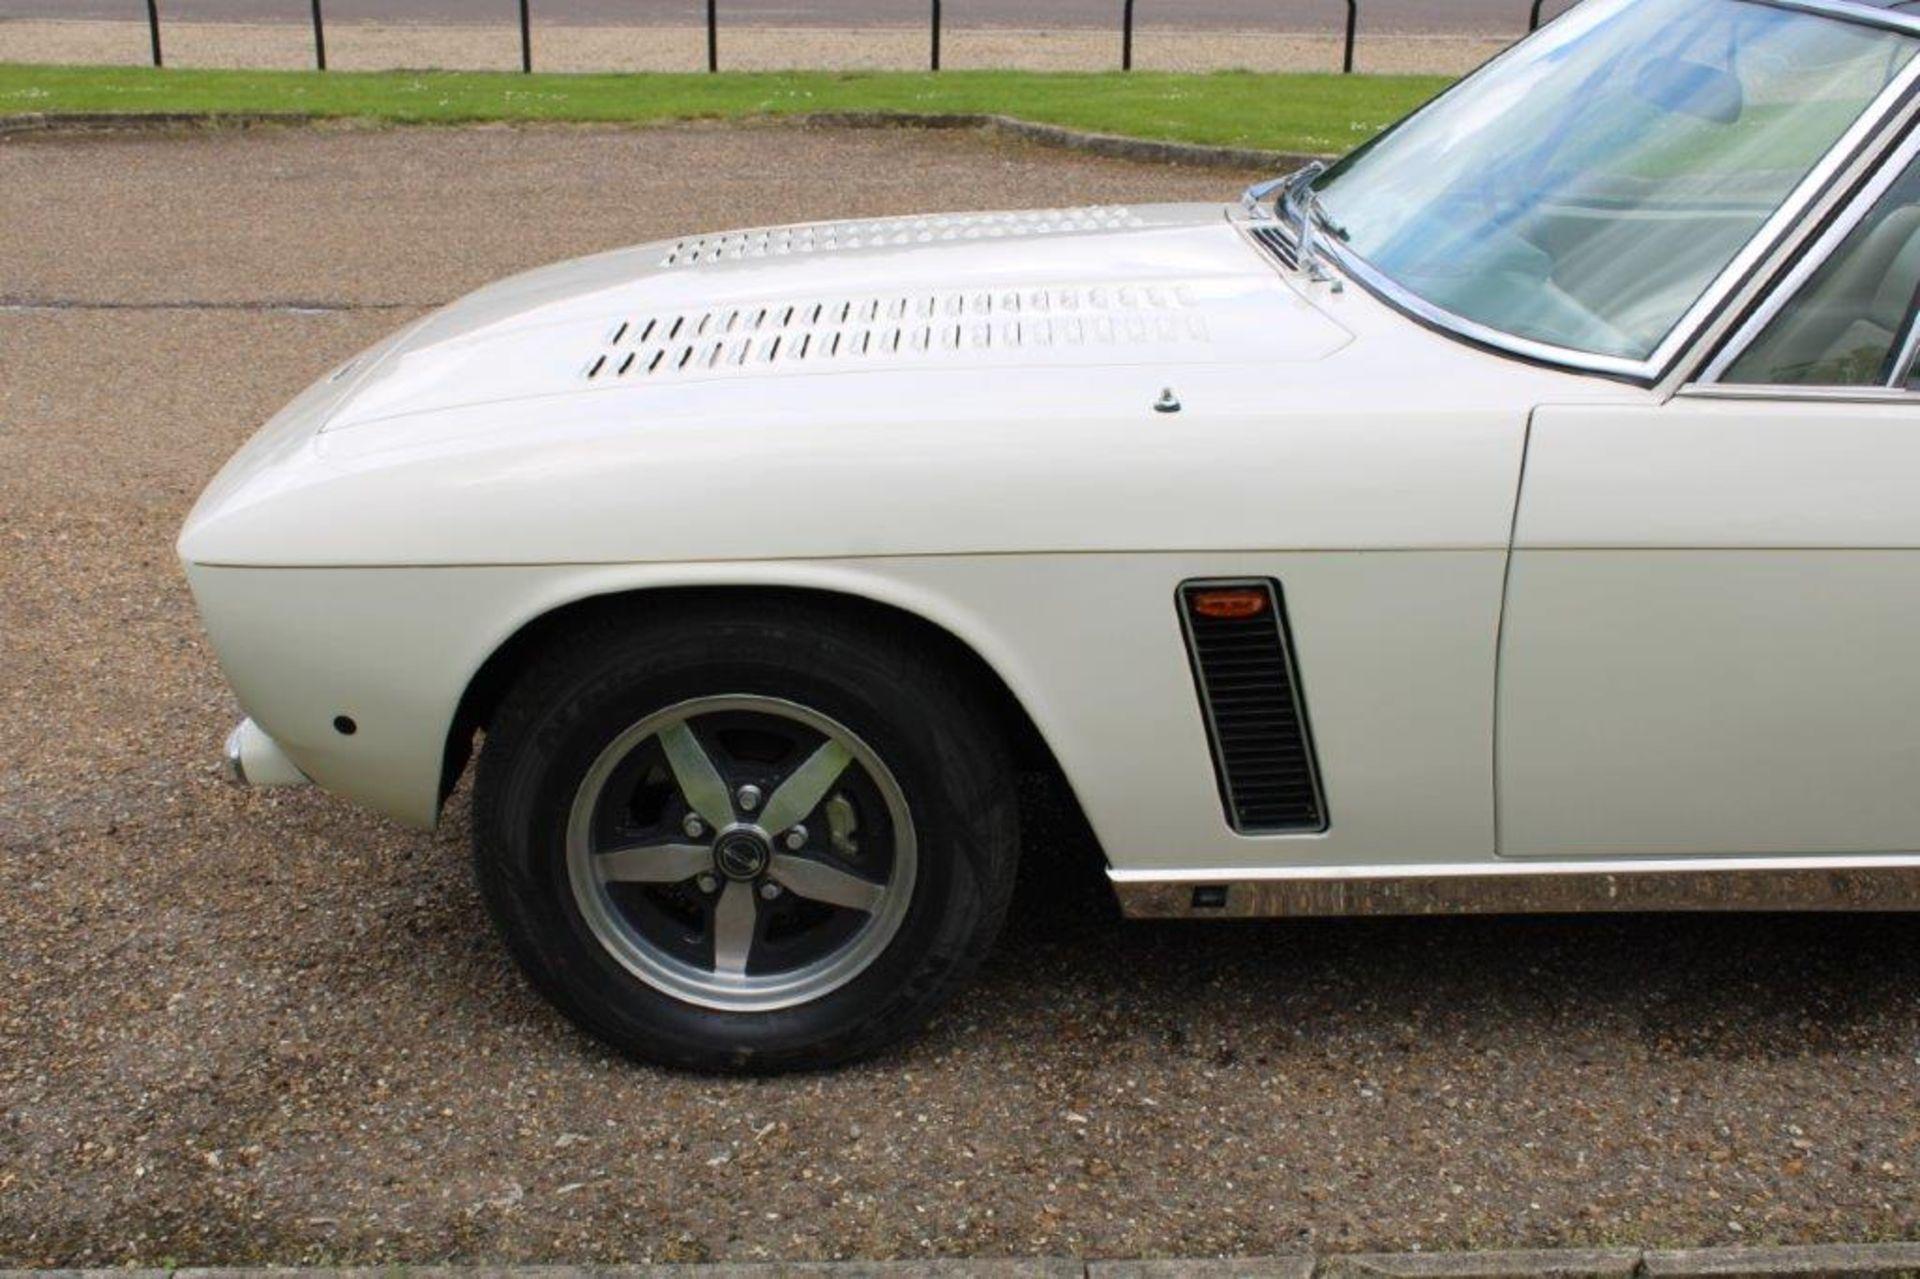 1972 Jensen Interceptor SP Auto - Image 10 of 32